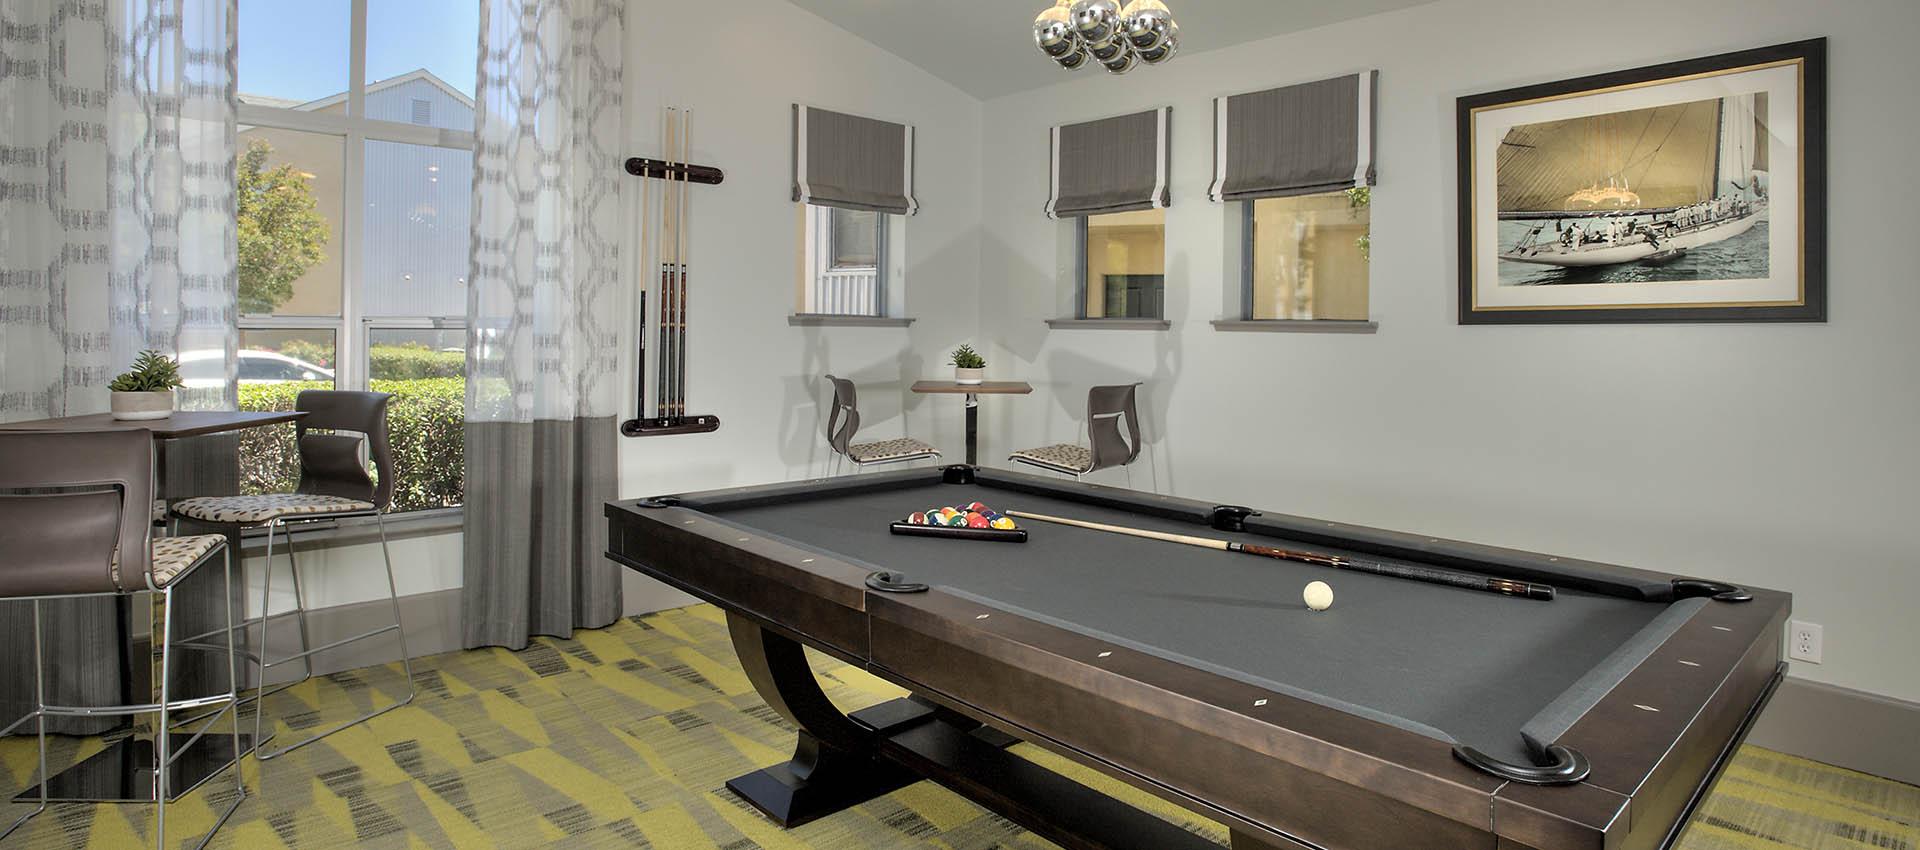 Photos Of Azure Apartment Homes In Petaluma Ca